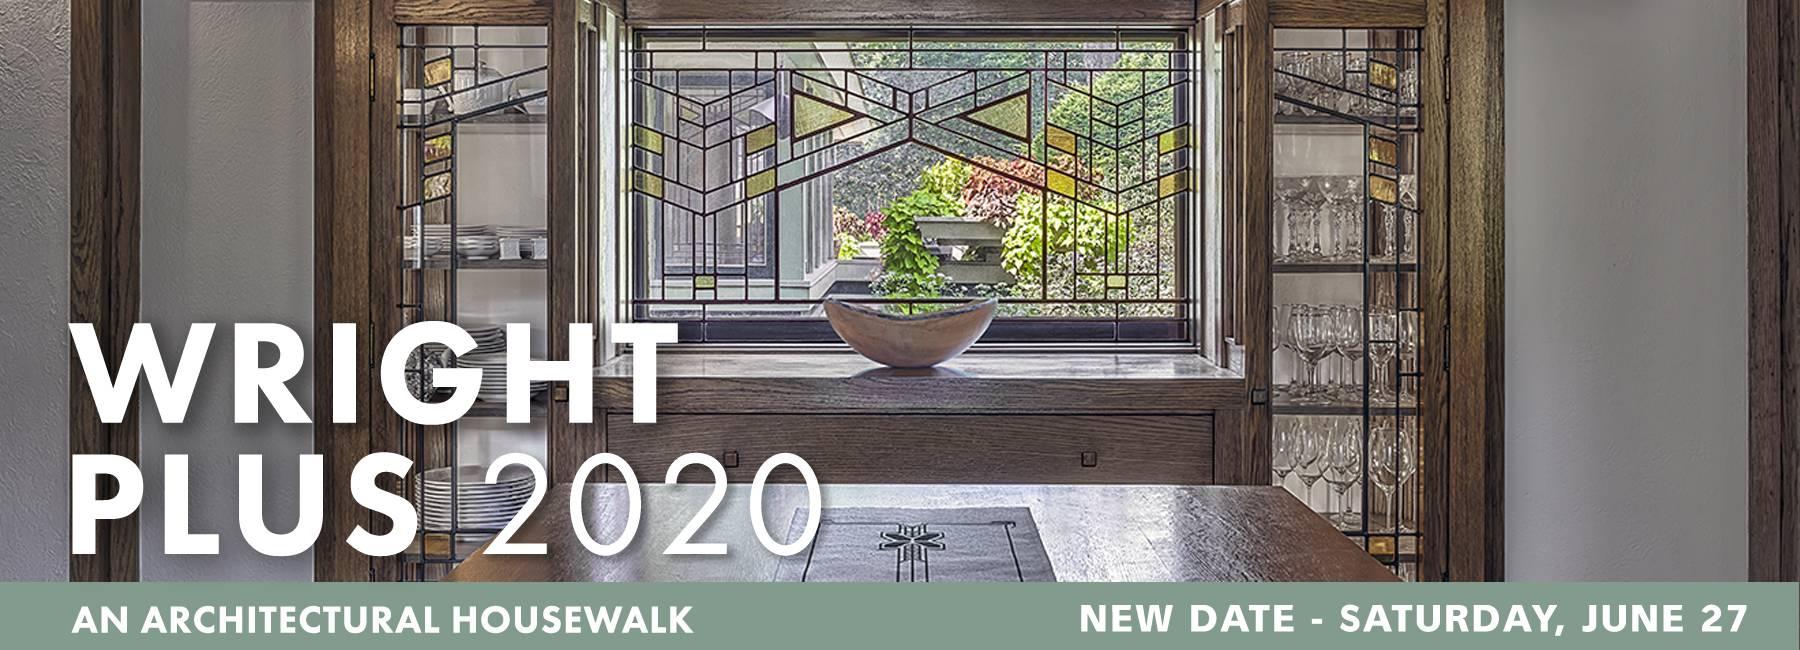 Wright Plus Housewalk June 27, 2020